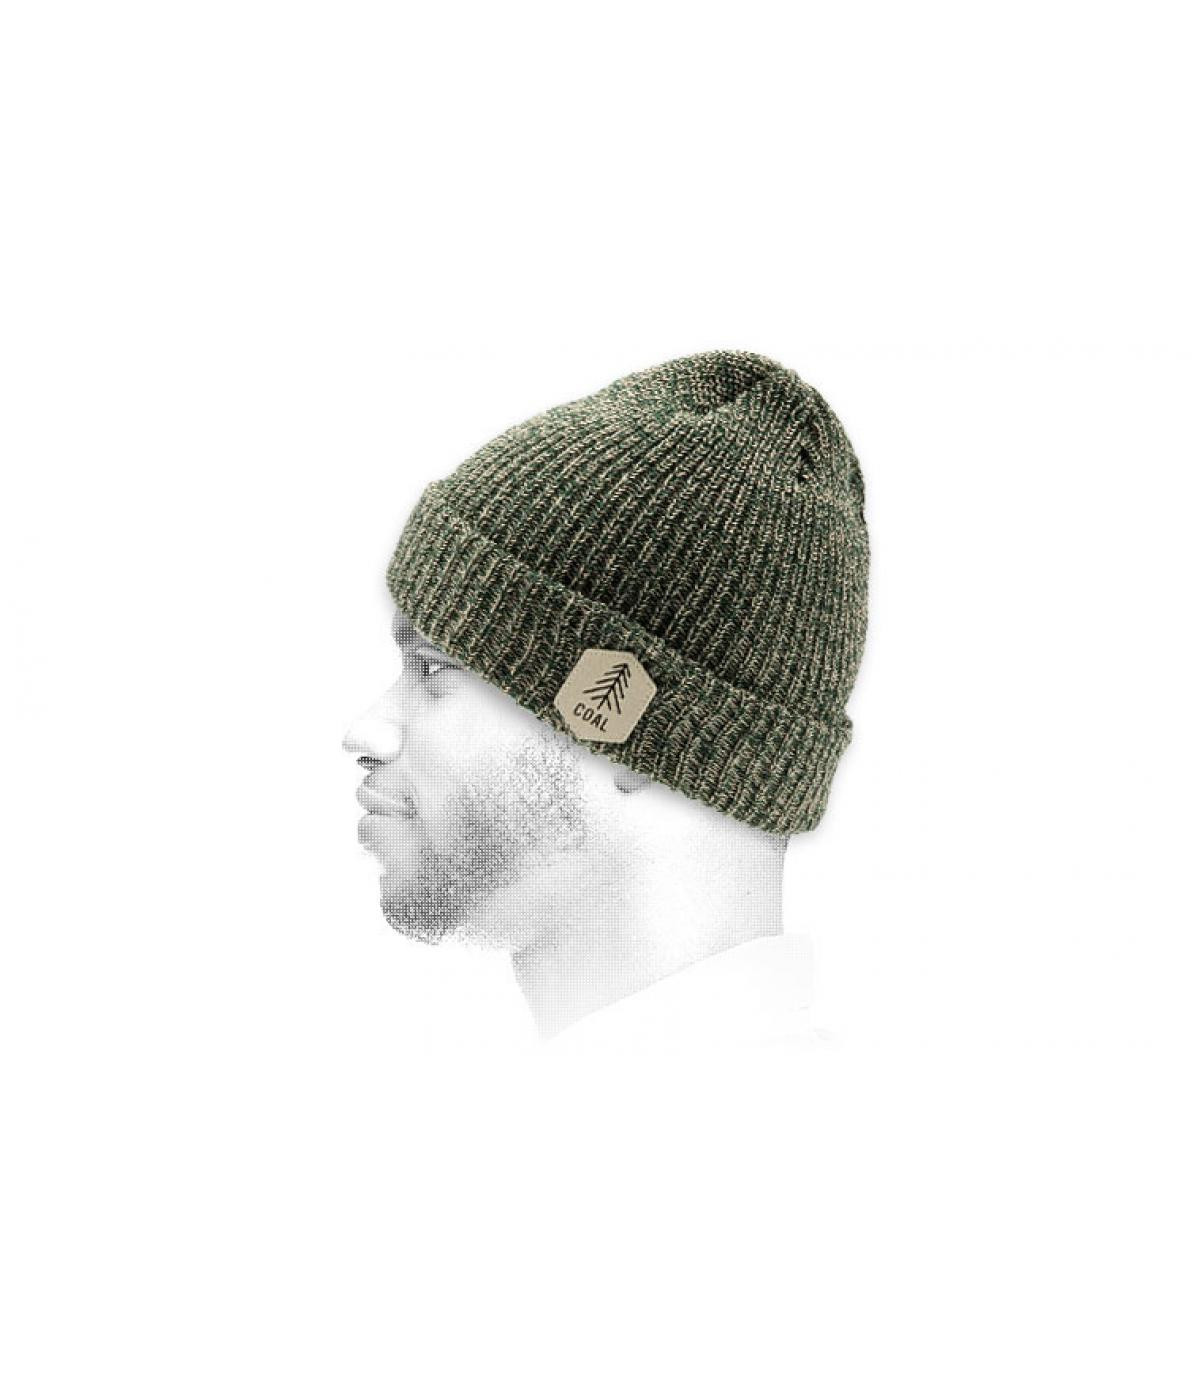 Mütze Revers grün Patch